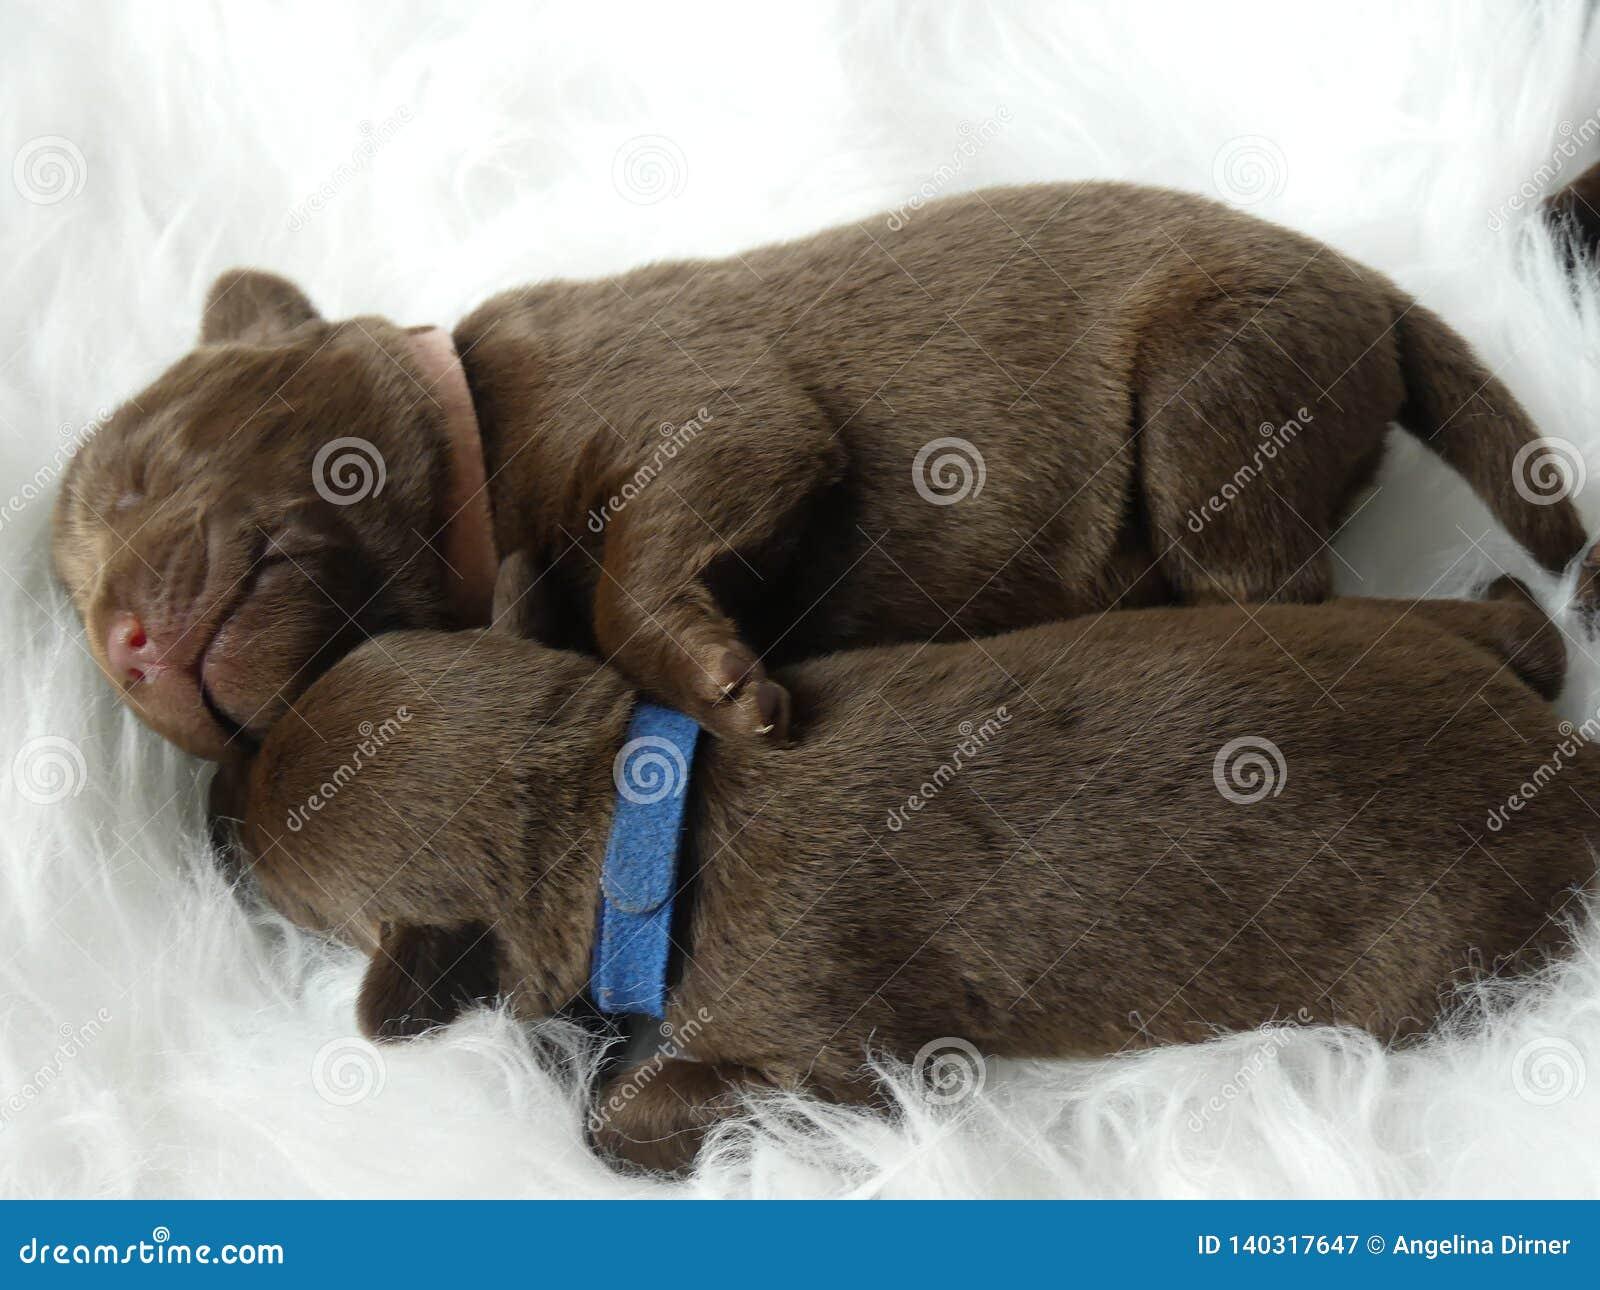 Sleeping Labrador Puppies Stock Image Image Of Labrador 140317647